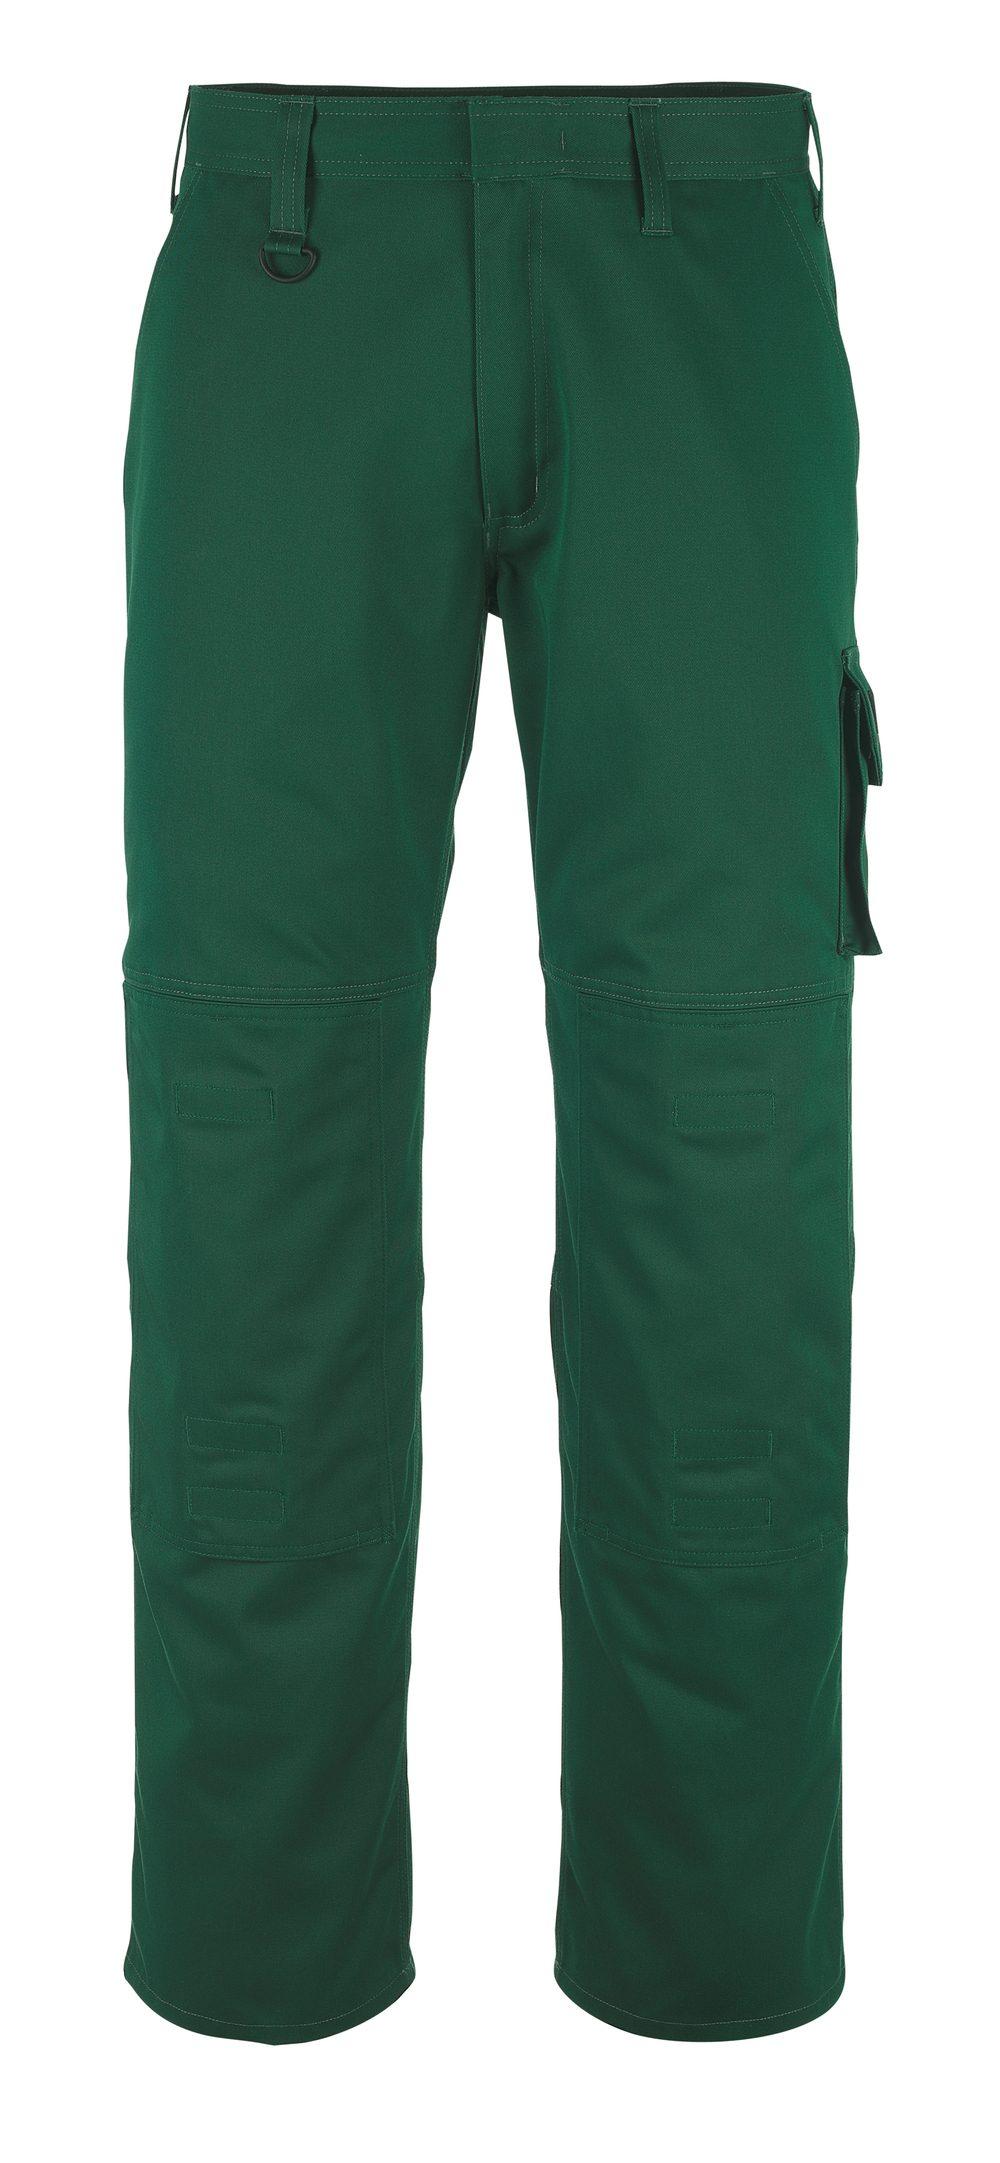 Pittsburgh Pants Green